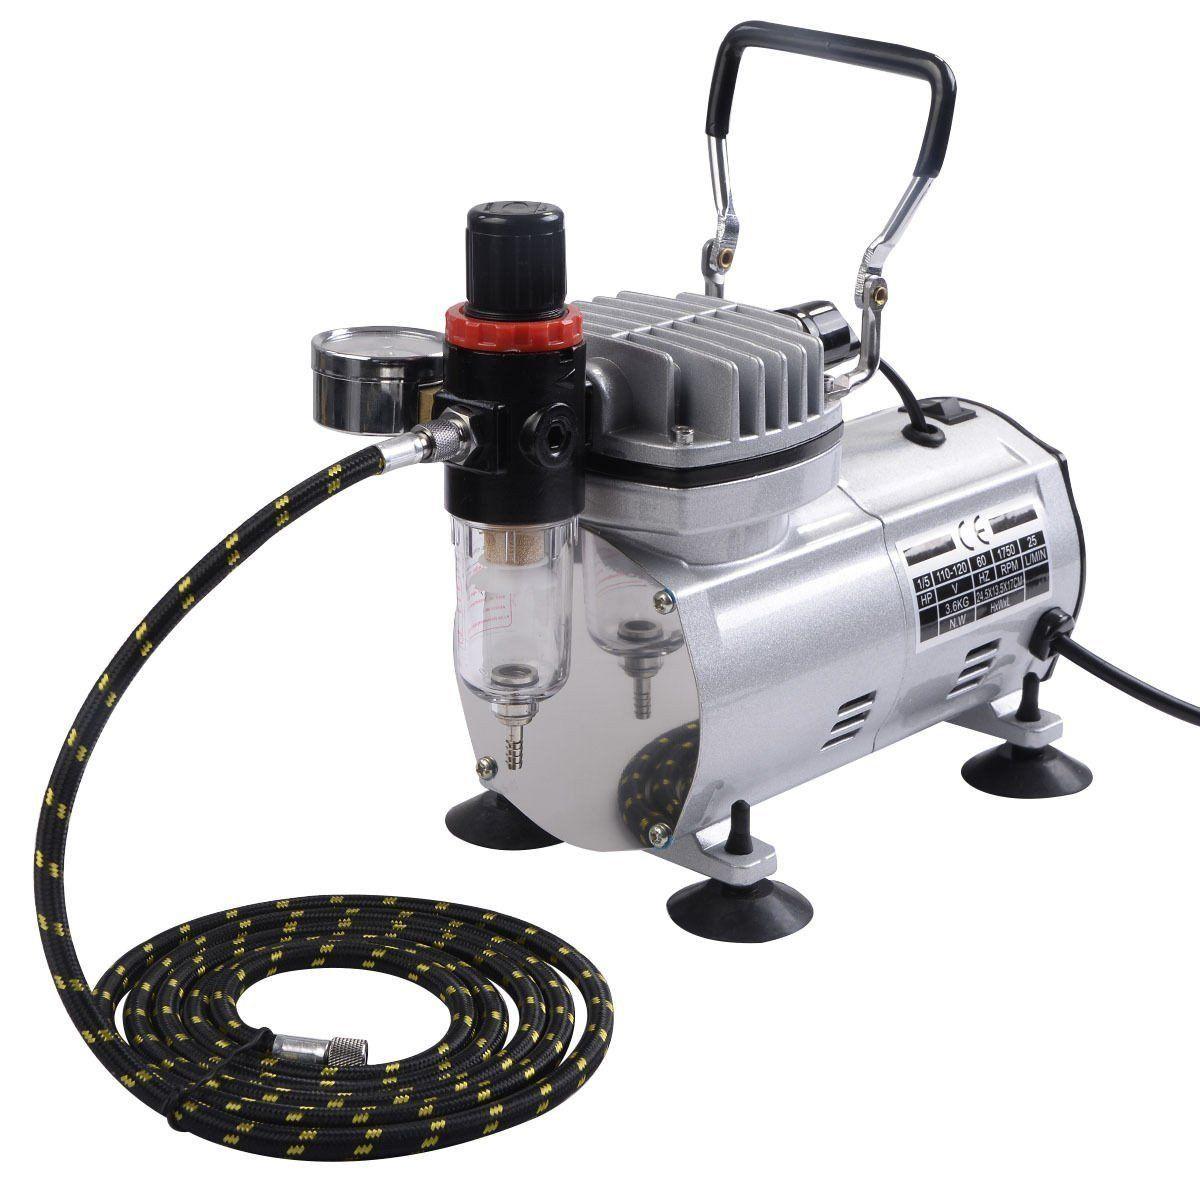 Airbrush & Compressor Kit Enamel spray paint, Airbrush